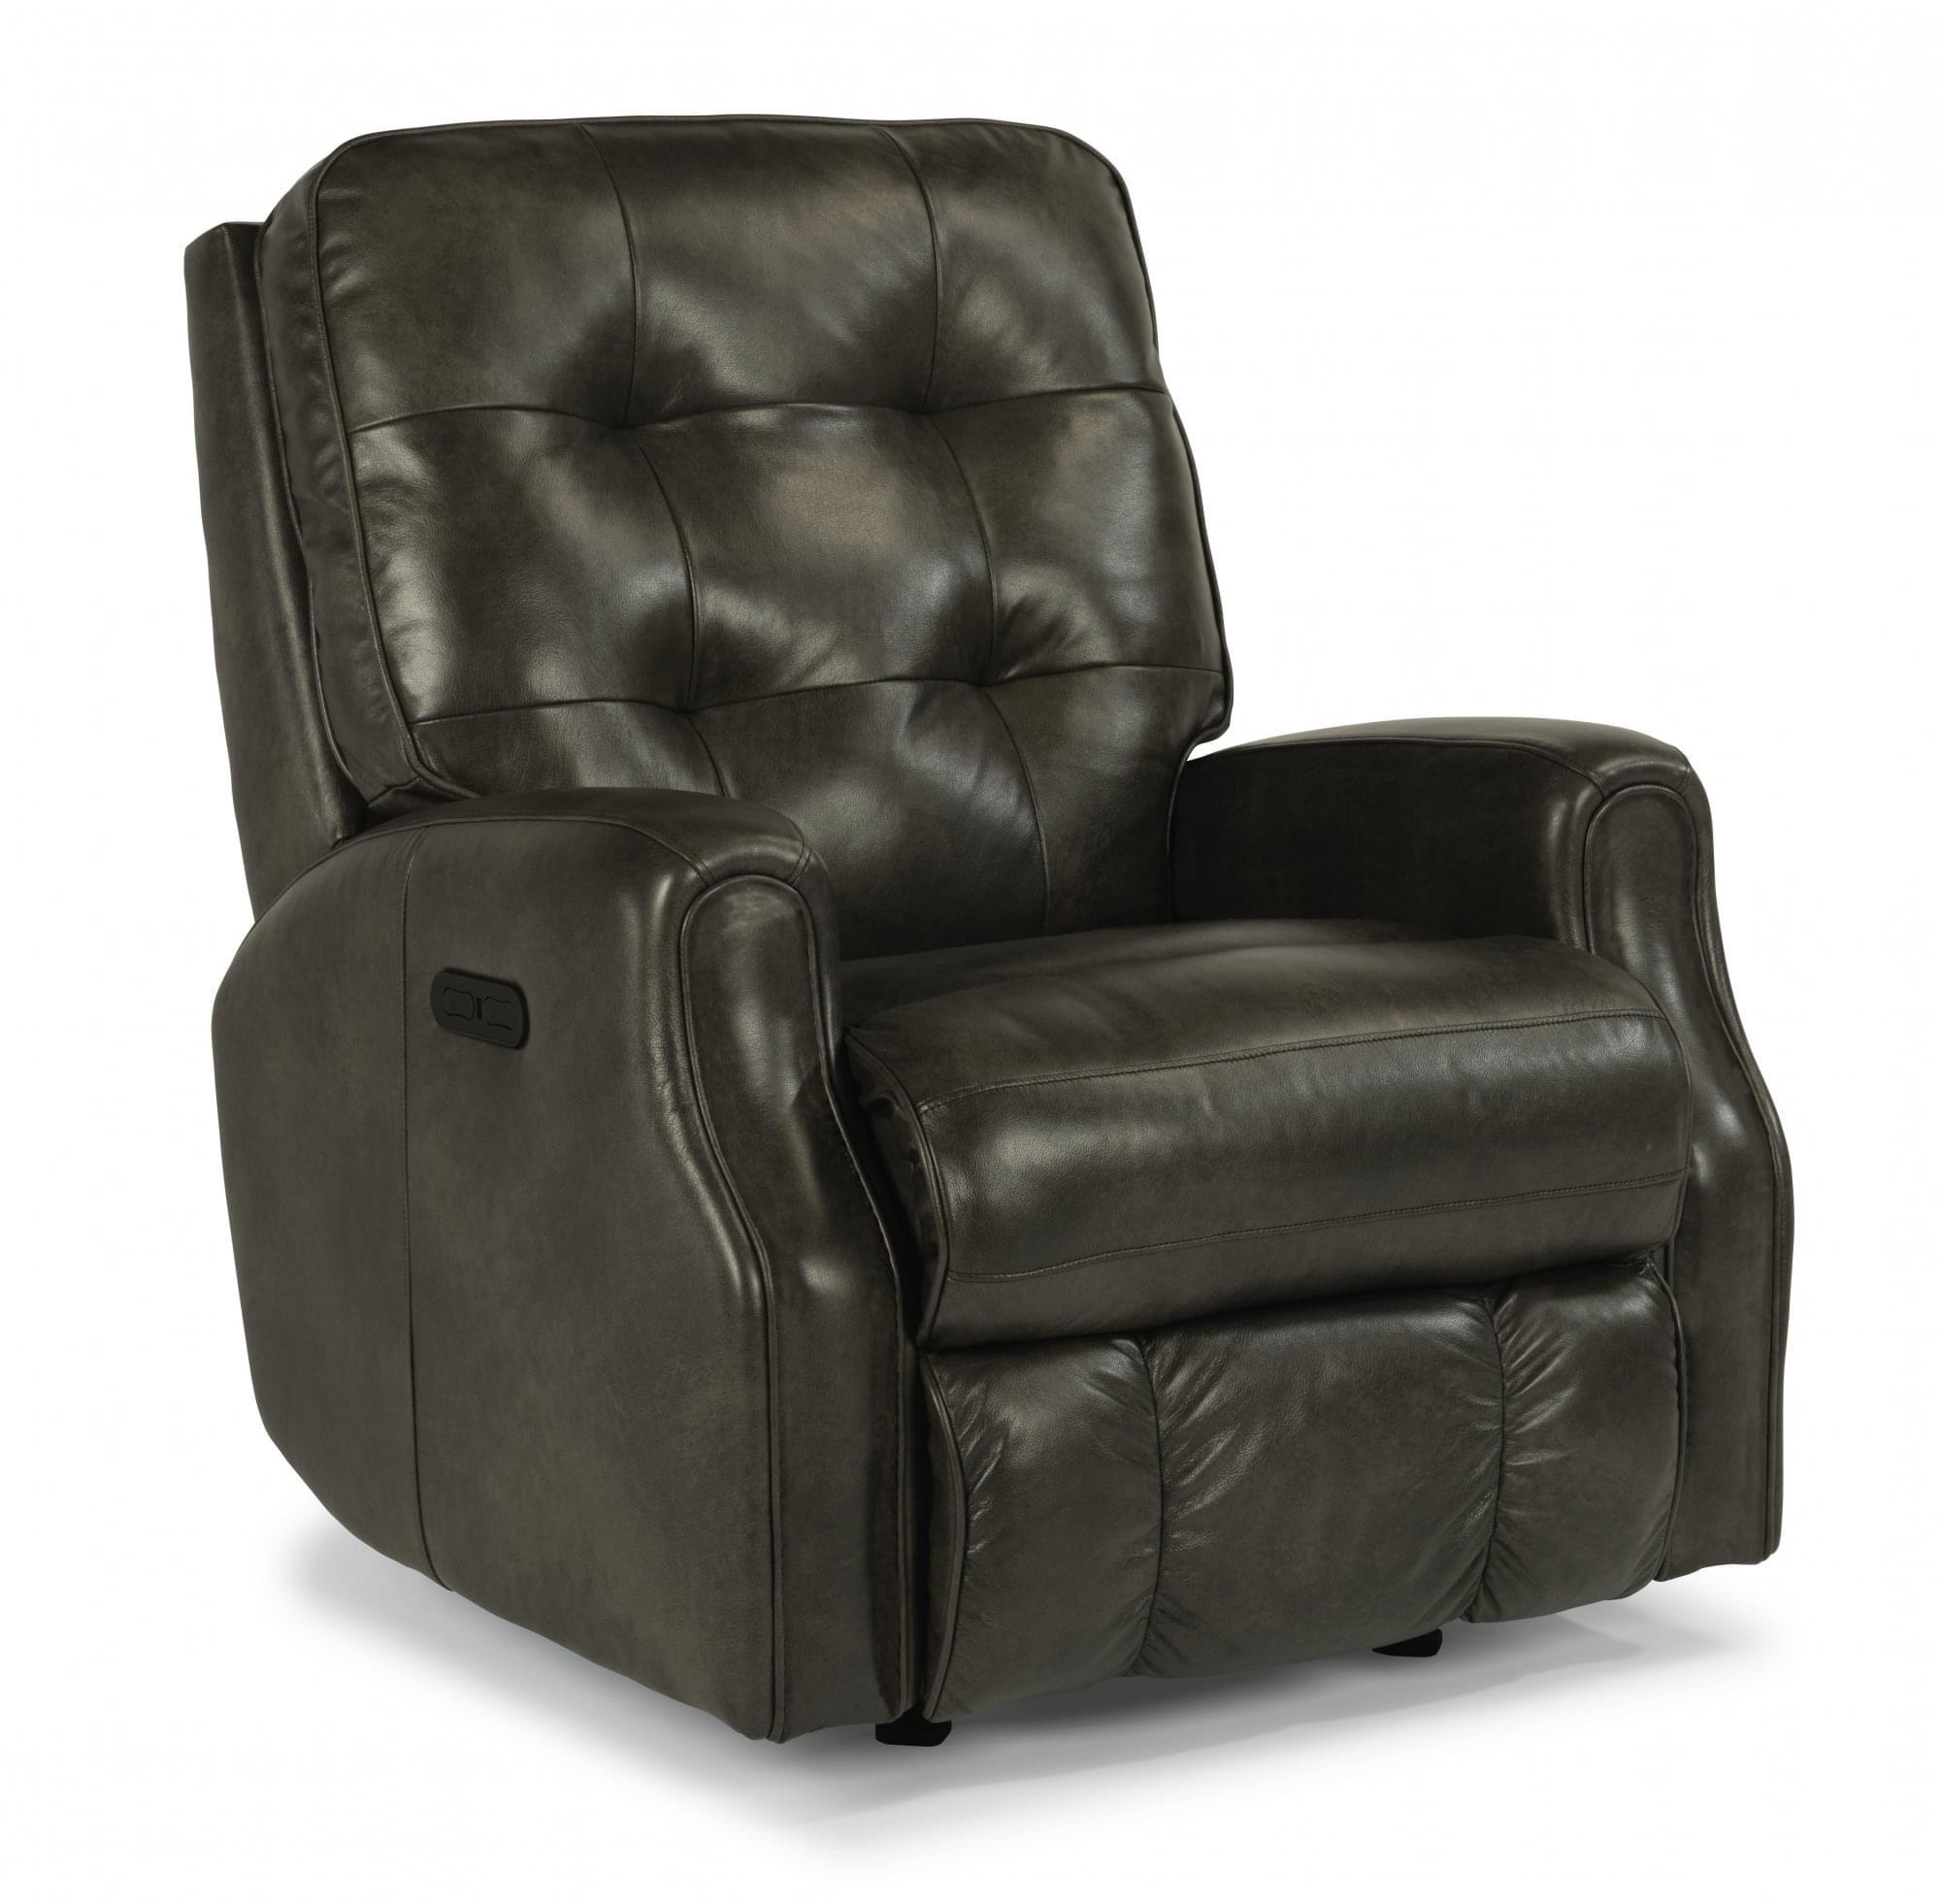 Flexsteel Devon Recliner for Living Room at Mums Place Furniture Carmel CA